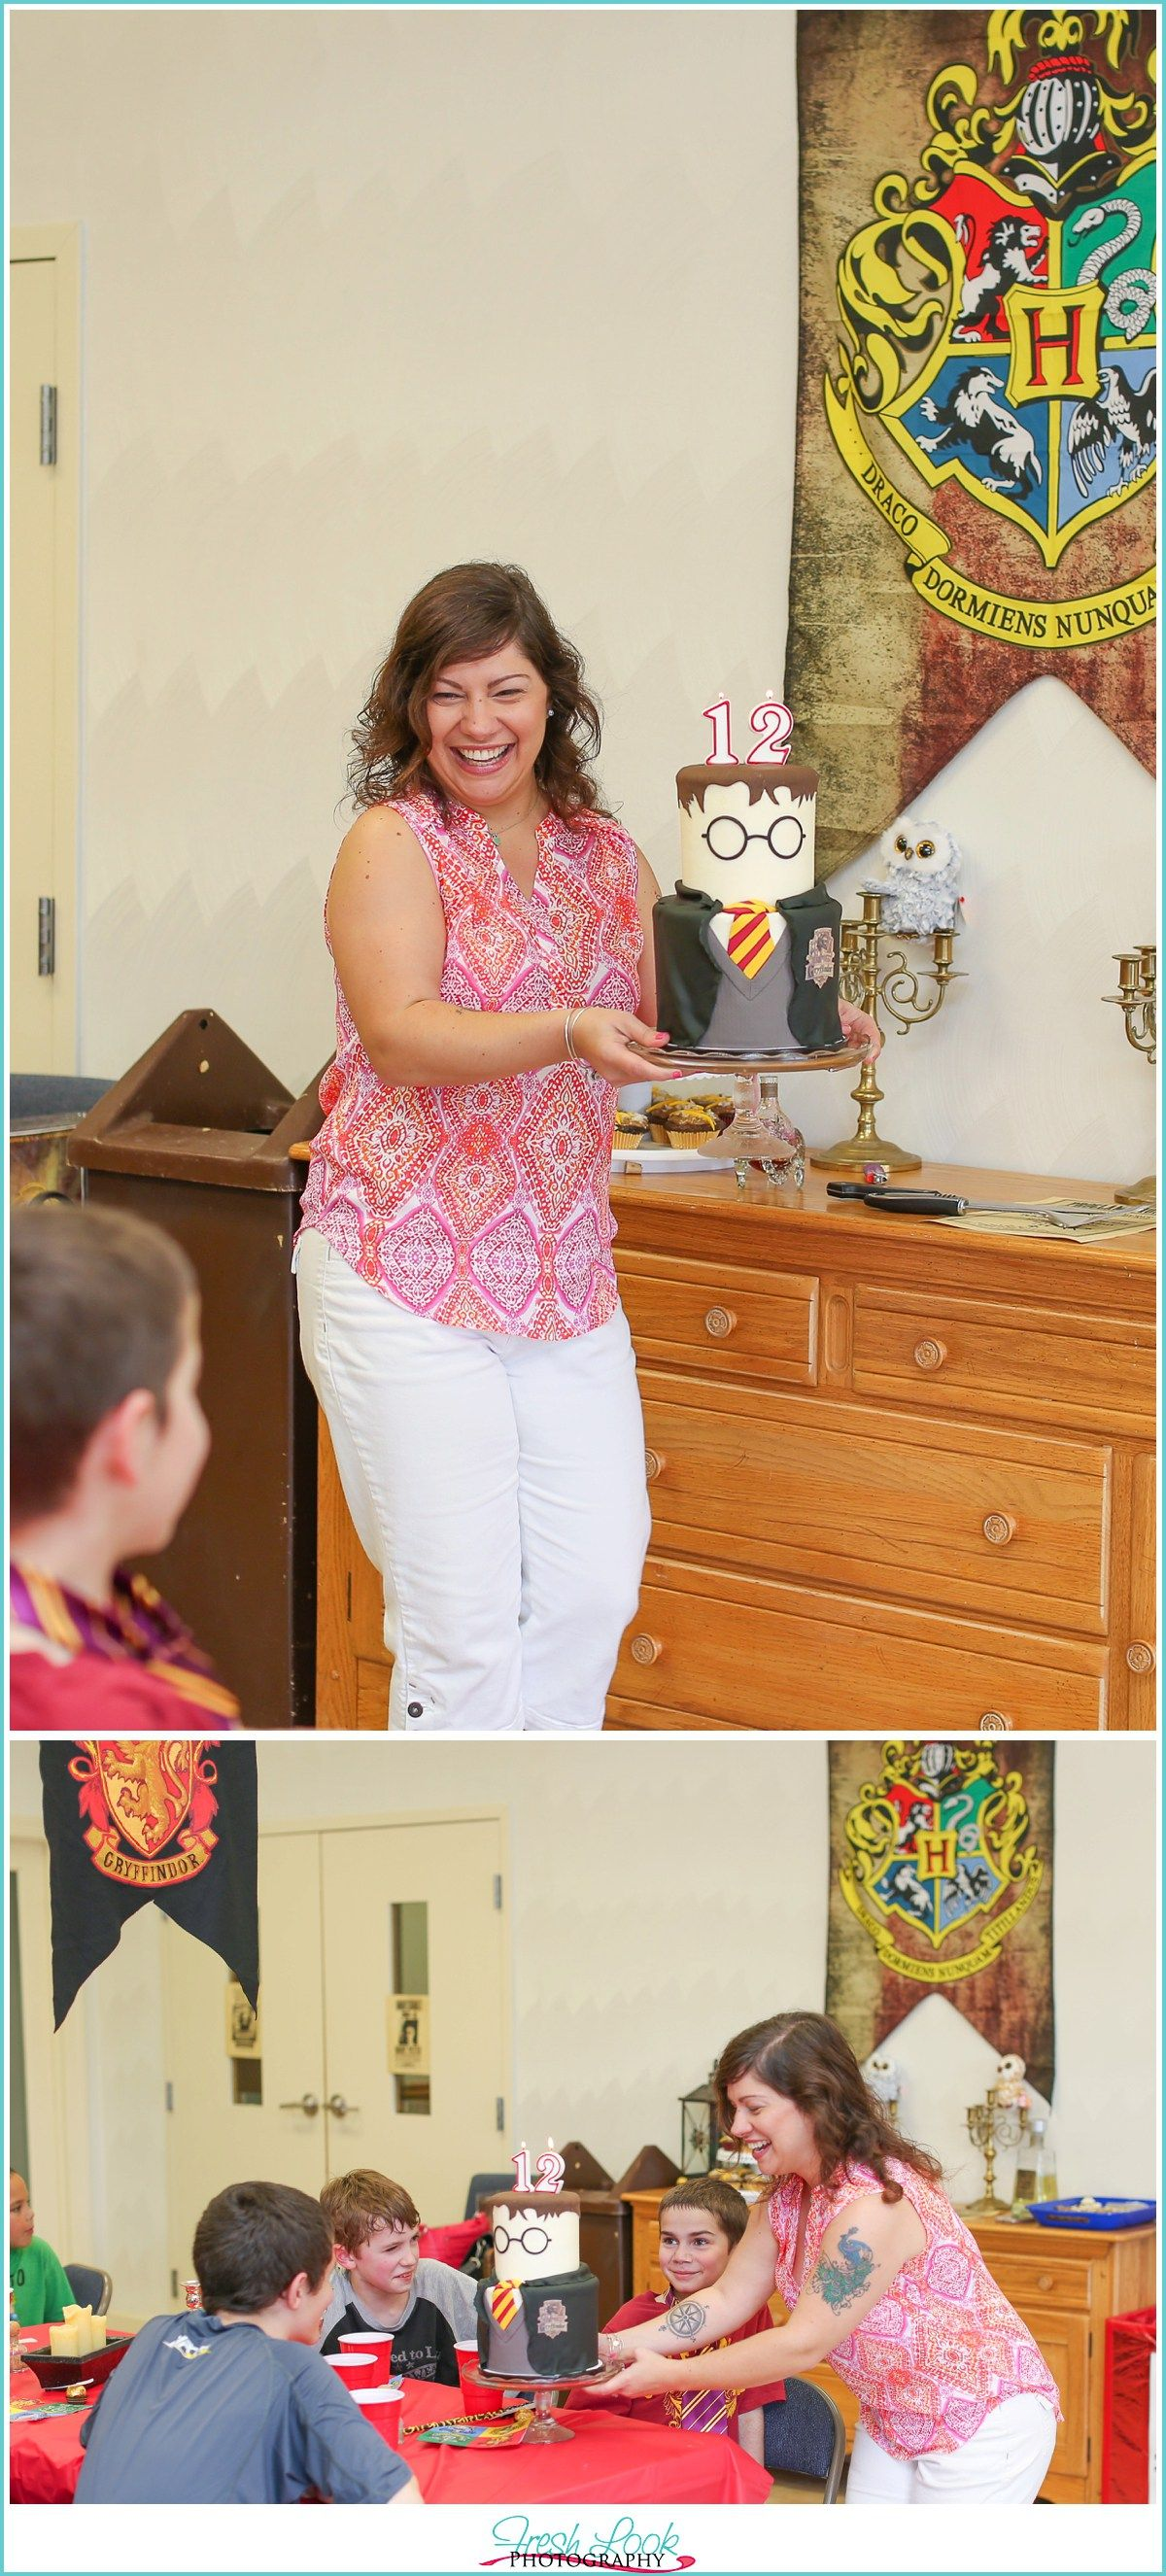 Harry Potter Birthday Party Hogwarts Ideas Themed Gryffindor 12th Virginia Beach